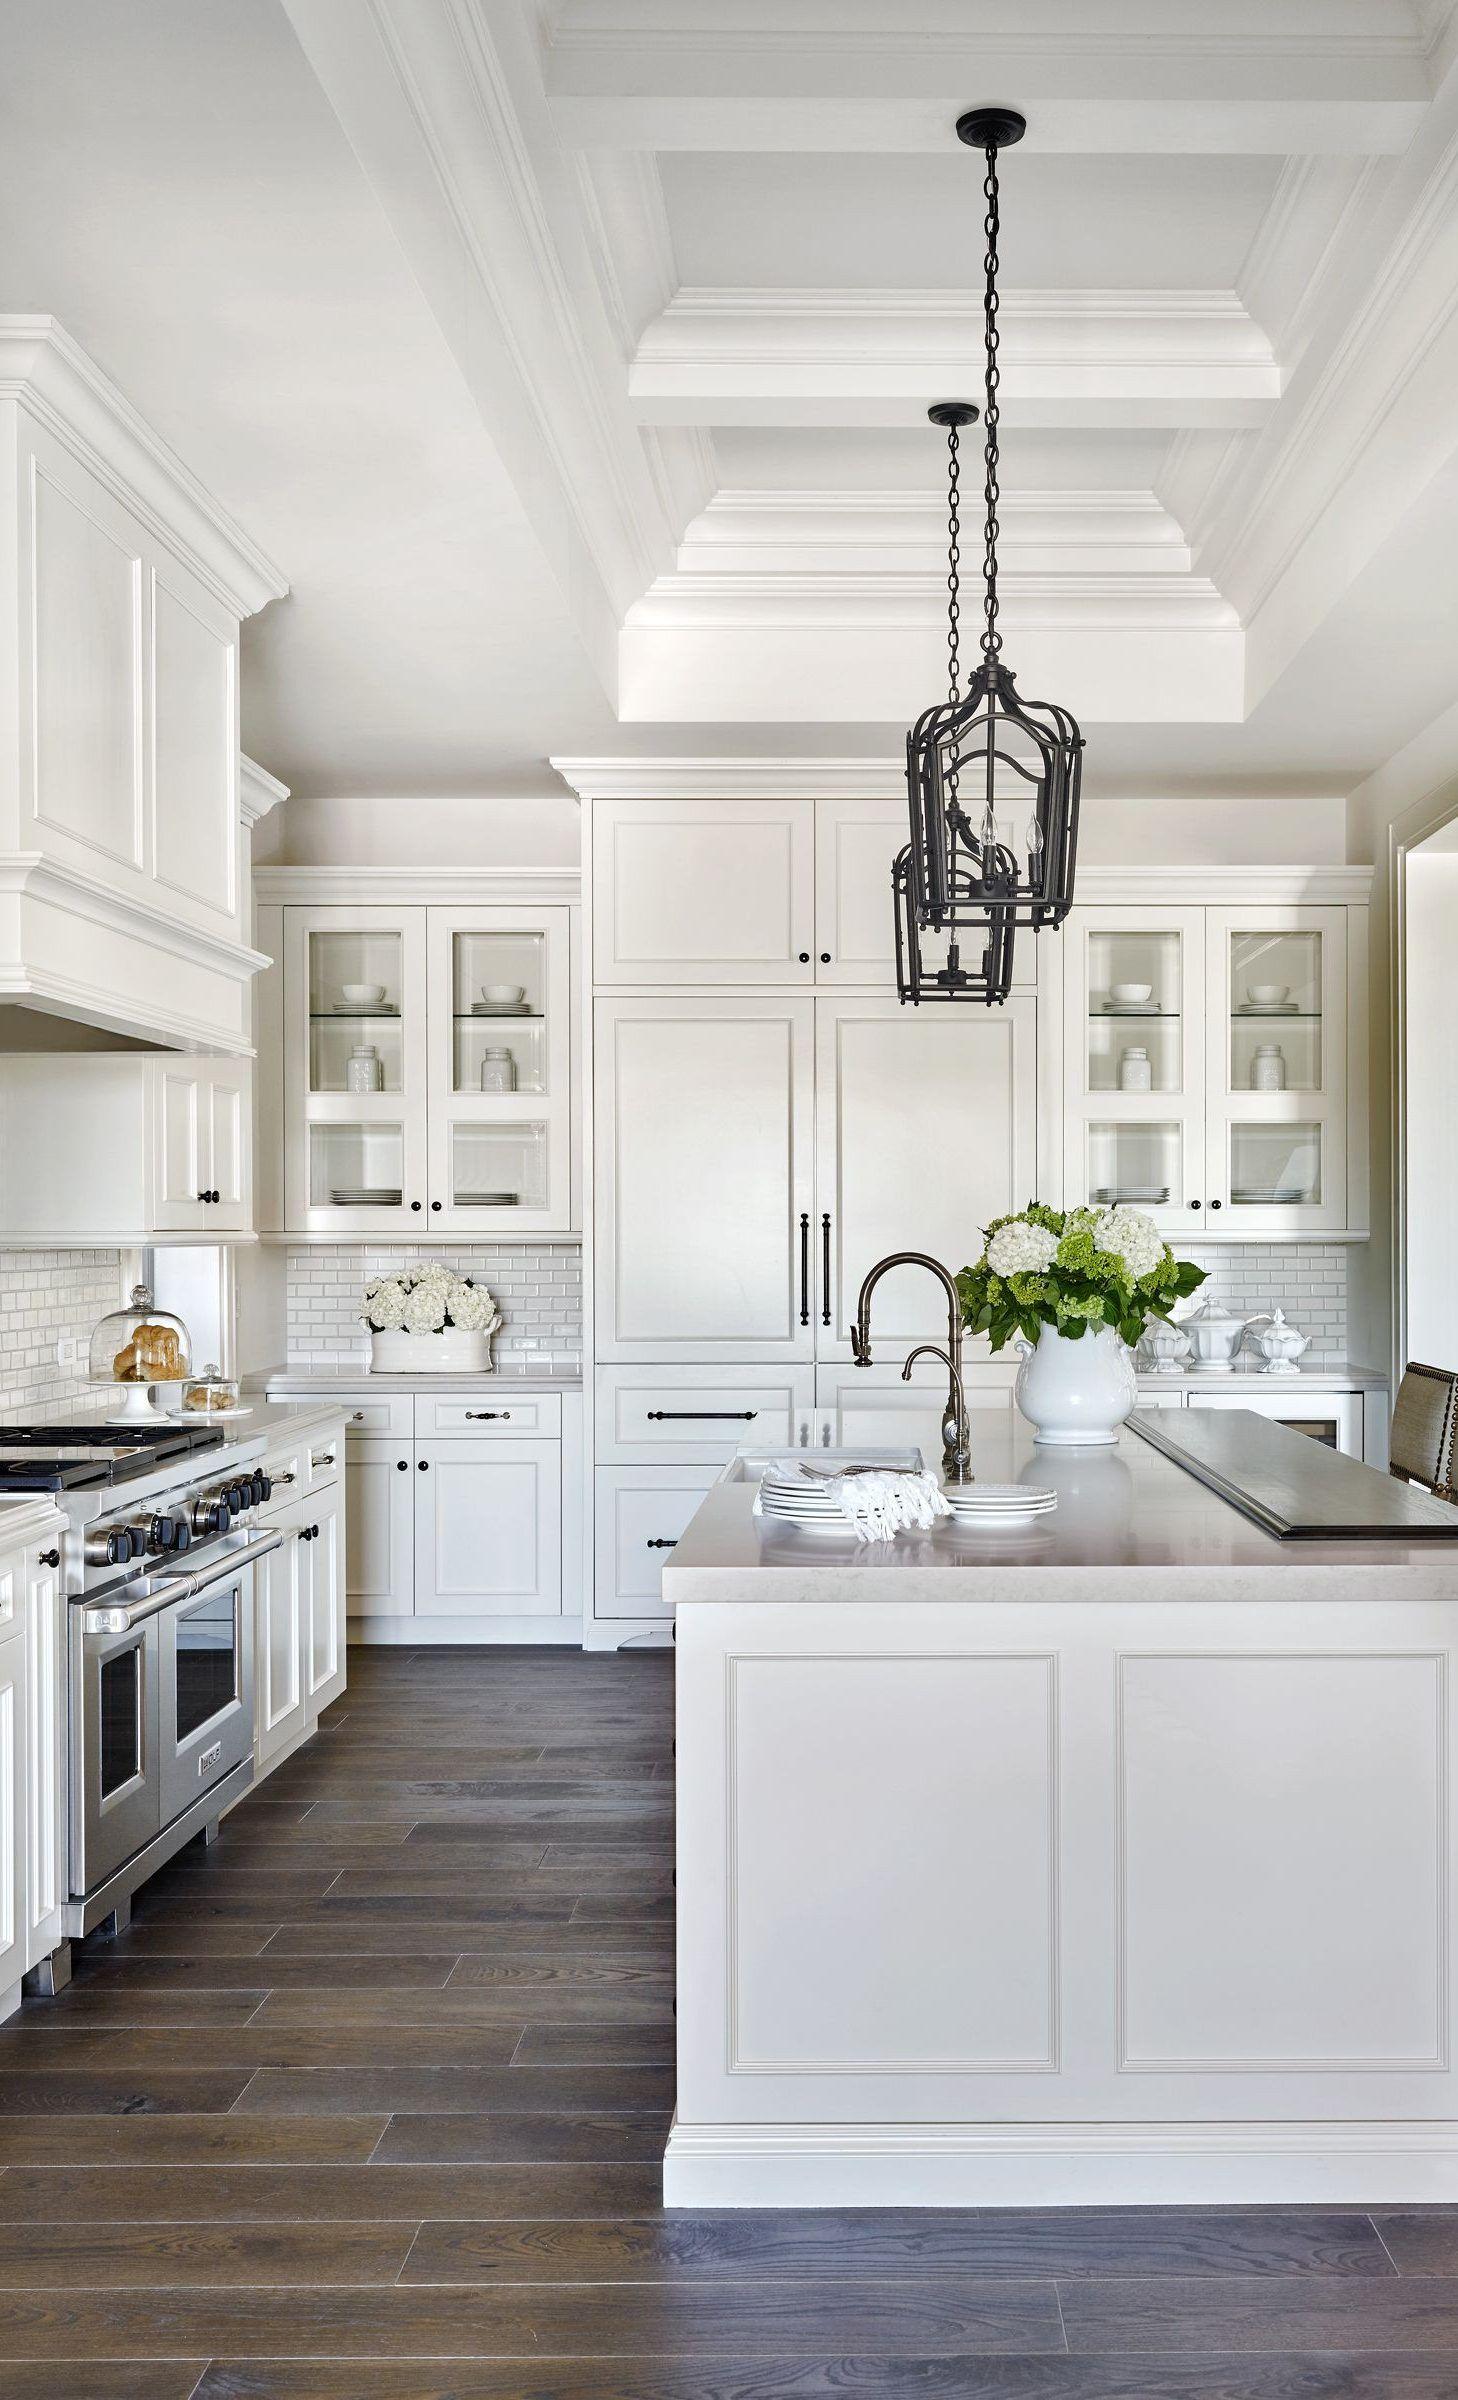 59 Best And Popular Kitchen Interior Design Ideas Of This Year